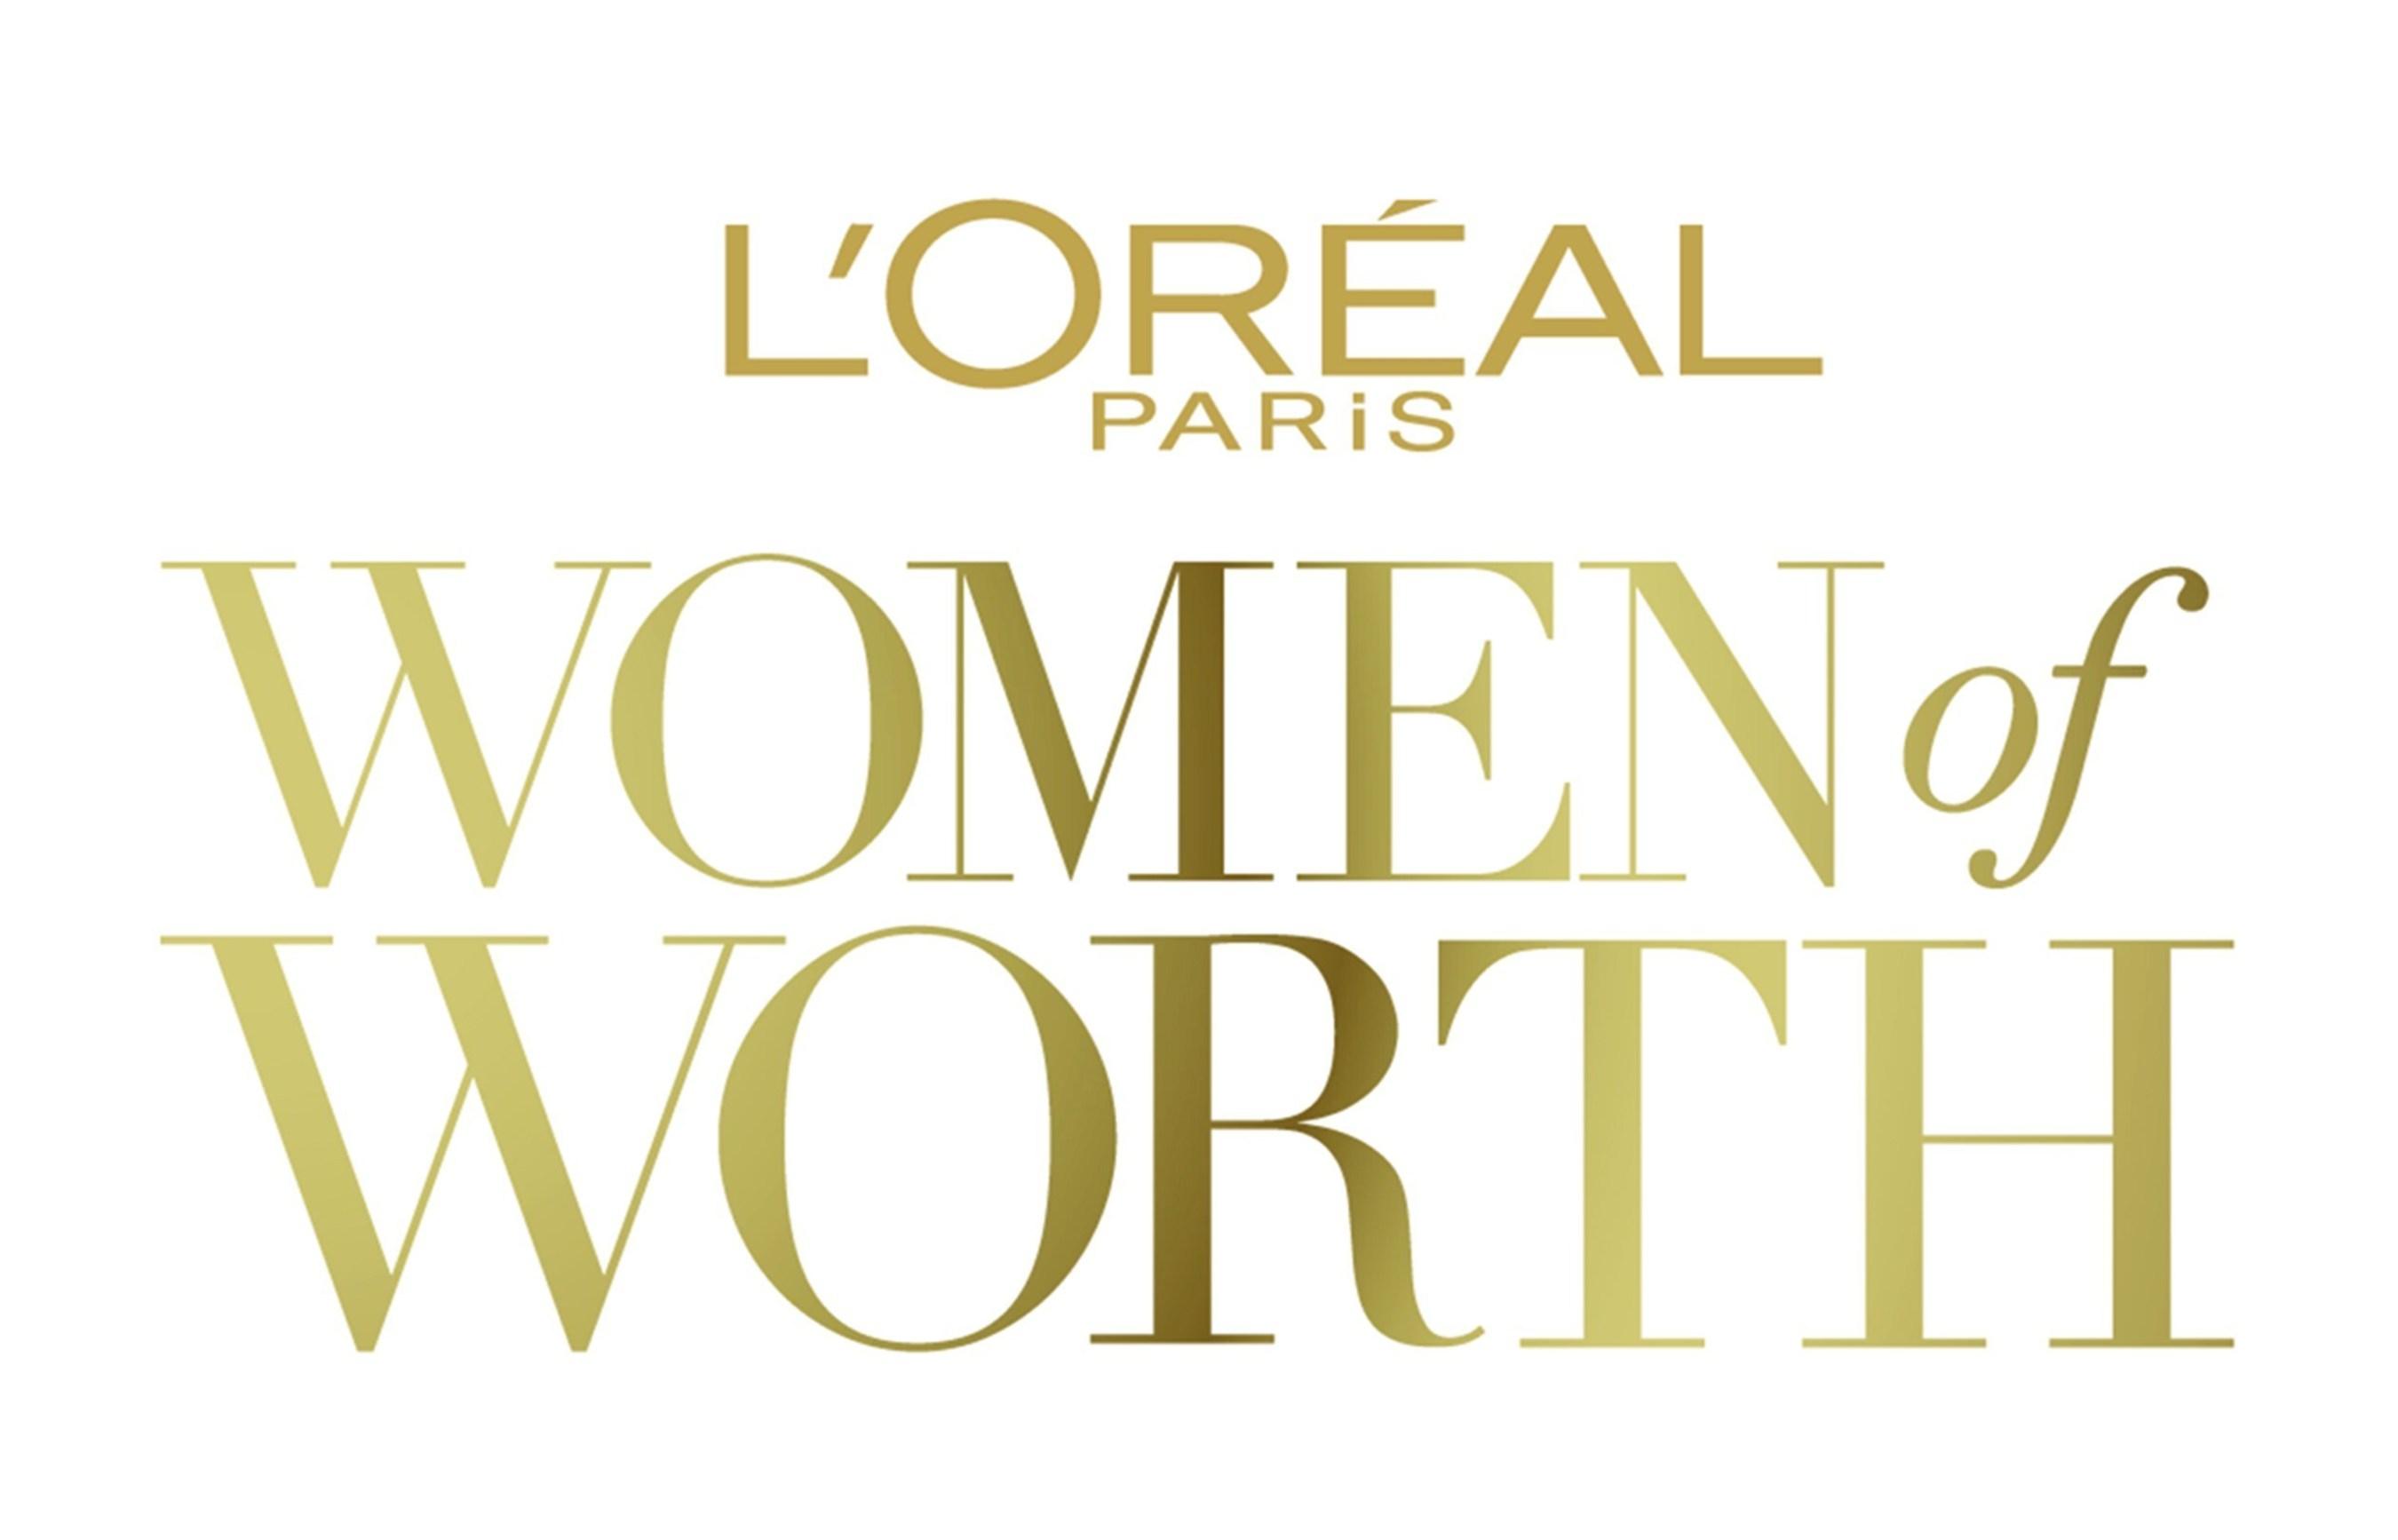 L'Oreal Paris Women of Worth